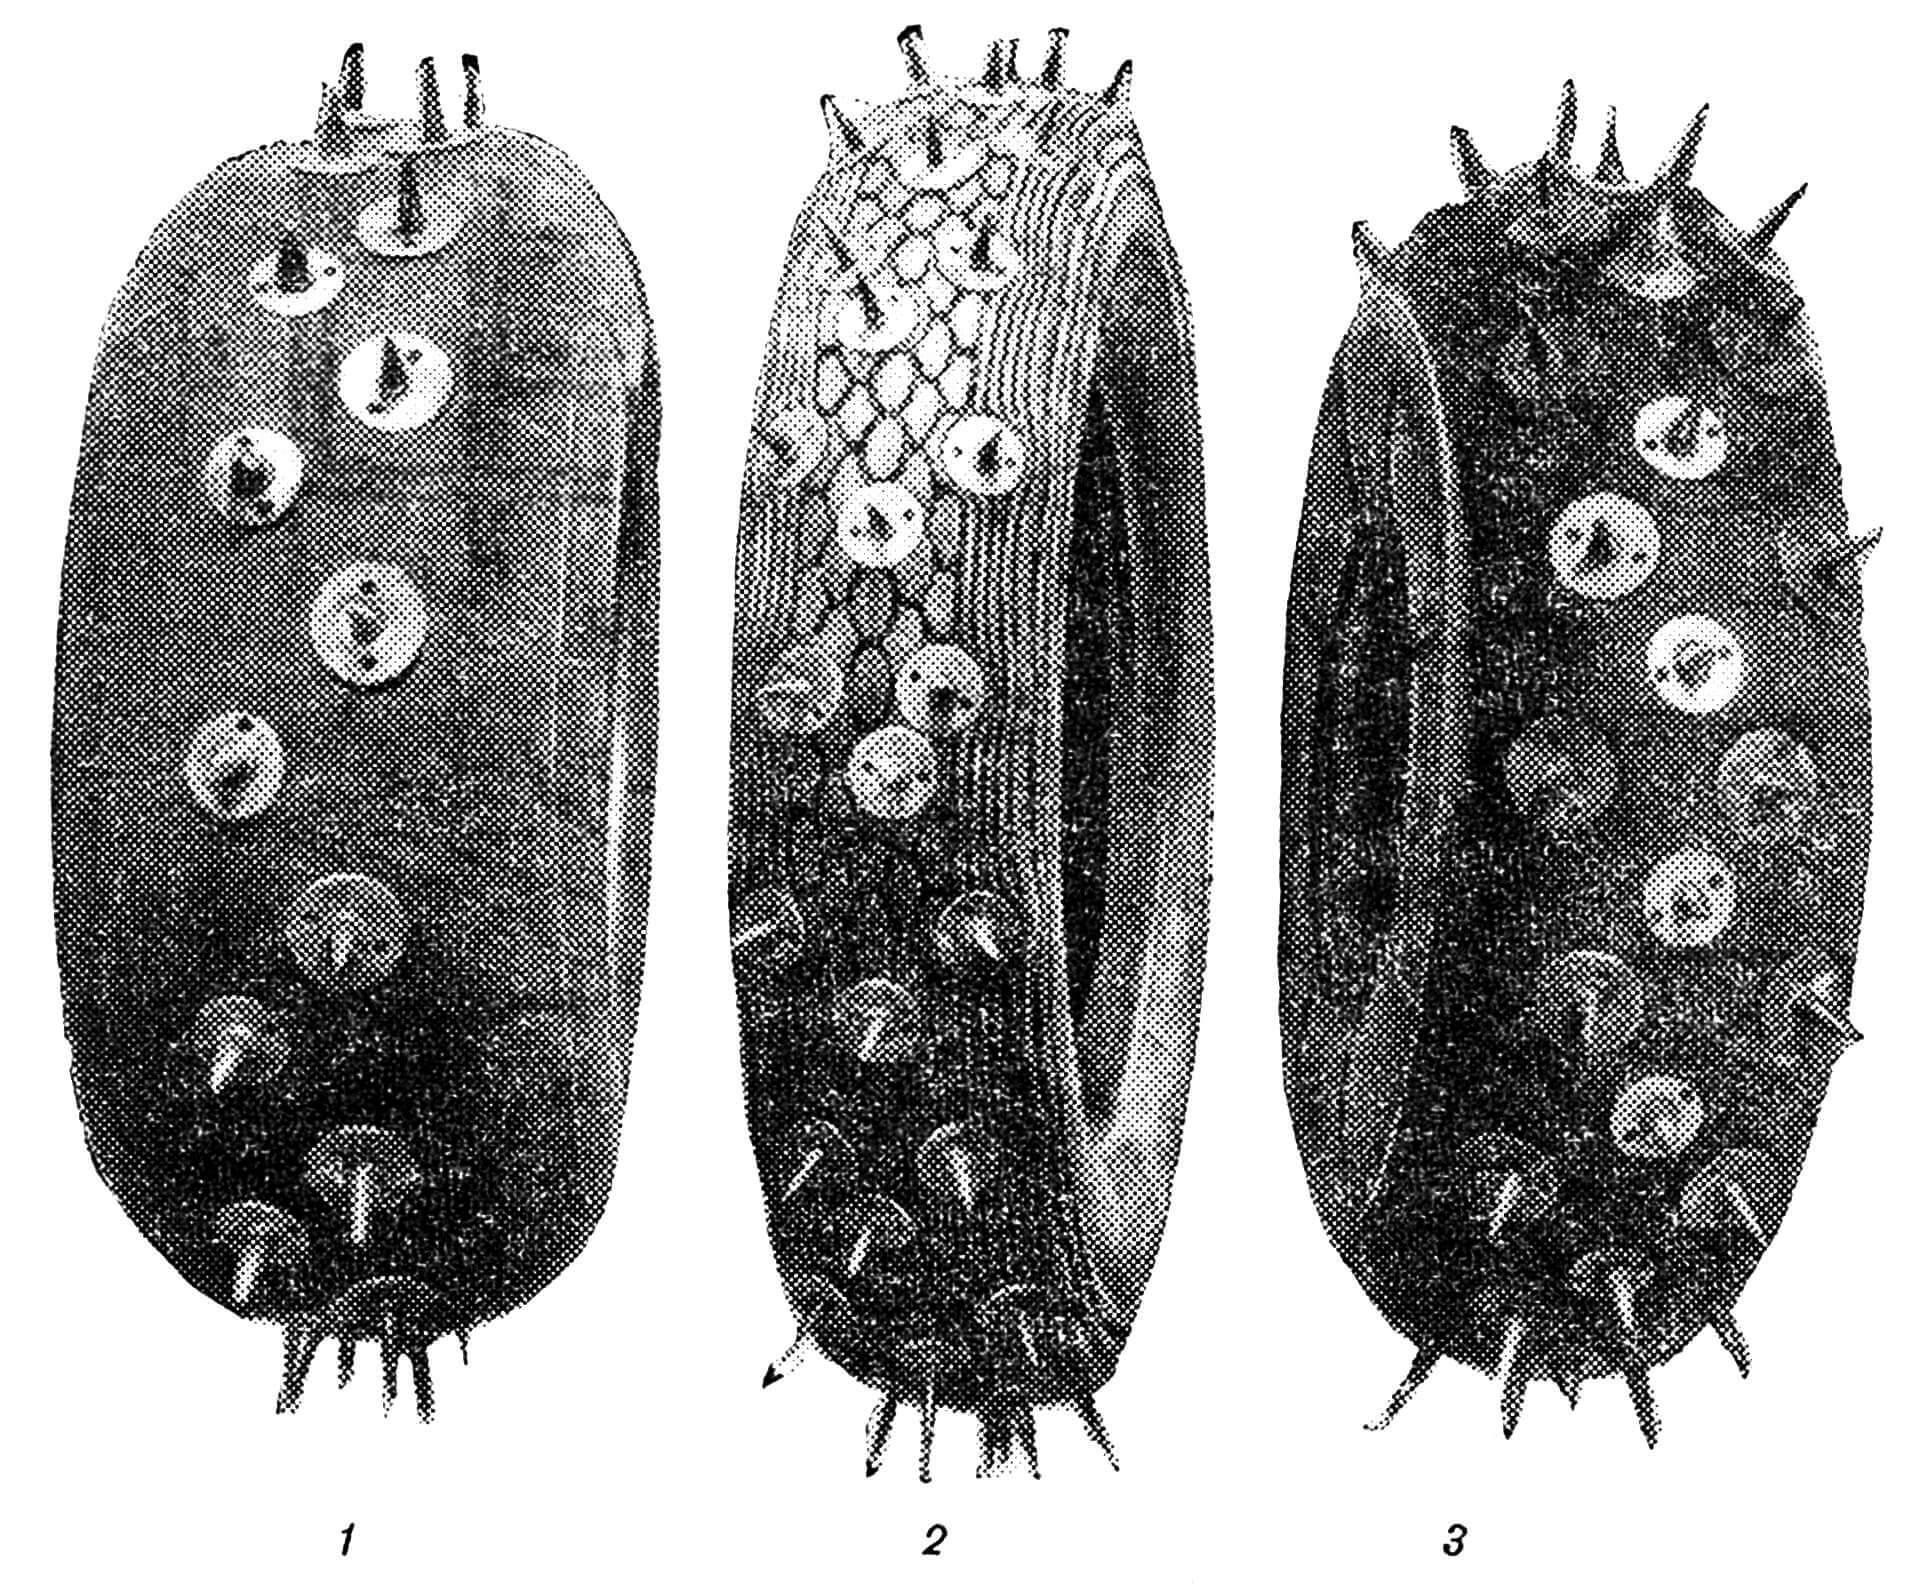 РИС. 1. КОЛЕСА КАРТА: 1 — переднее колесо (ø 300 мм); 2 — заднее колесо ( ø 460 мм); 3 — заднее колесо (ø 300 мм).